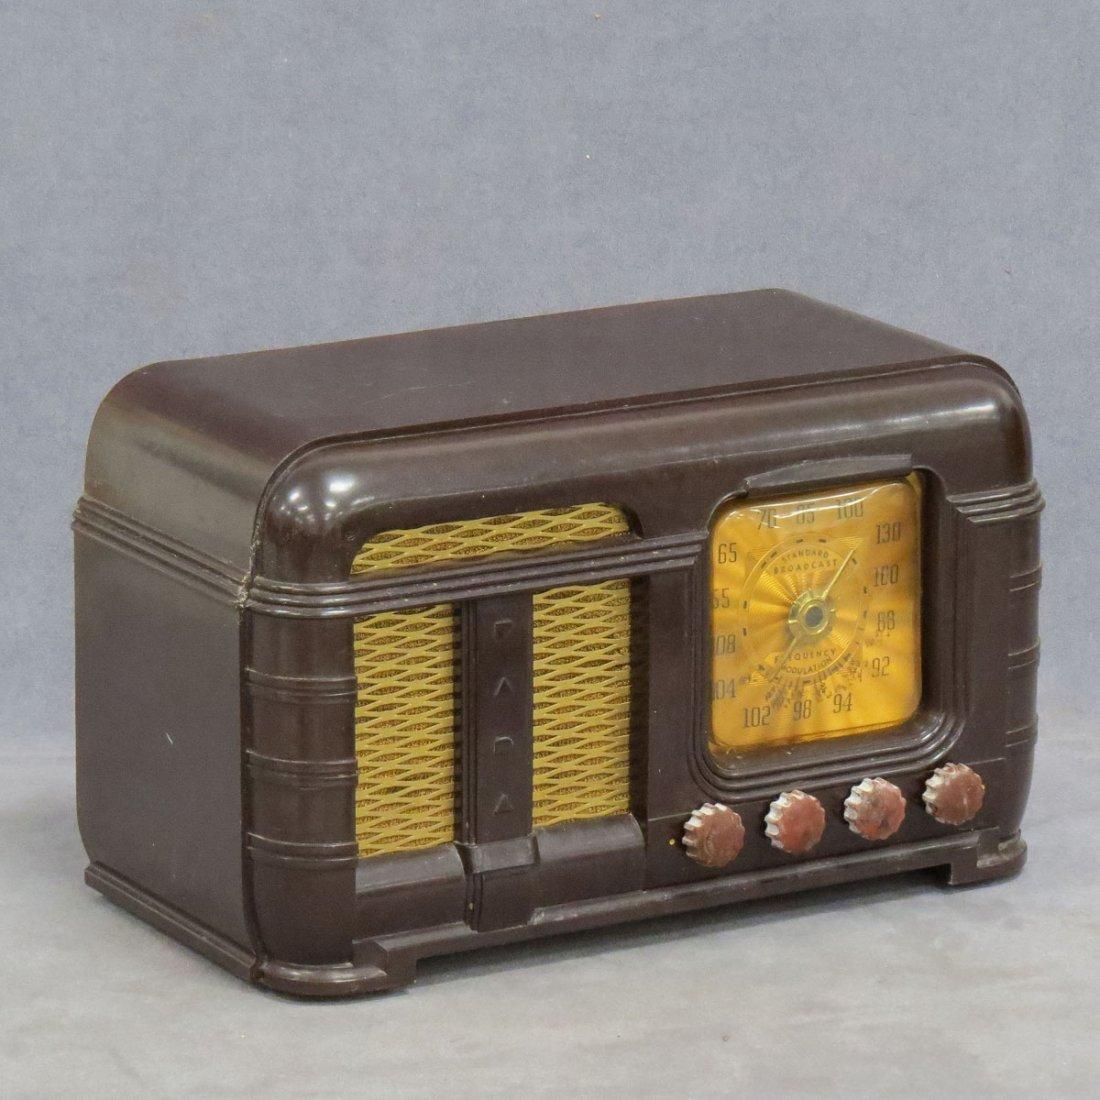 FADA MODEL 790 STANDARD BROADCAST RADIO